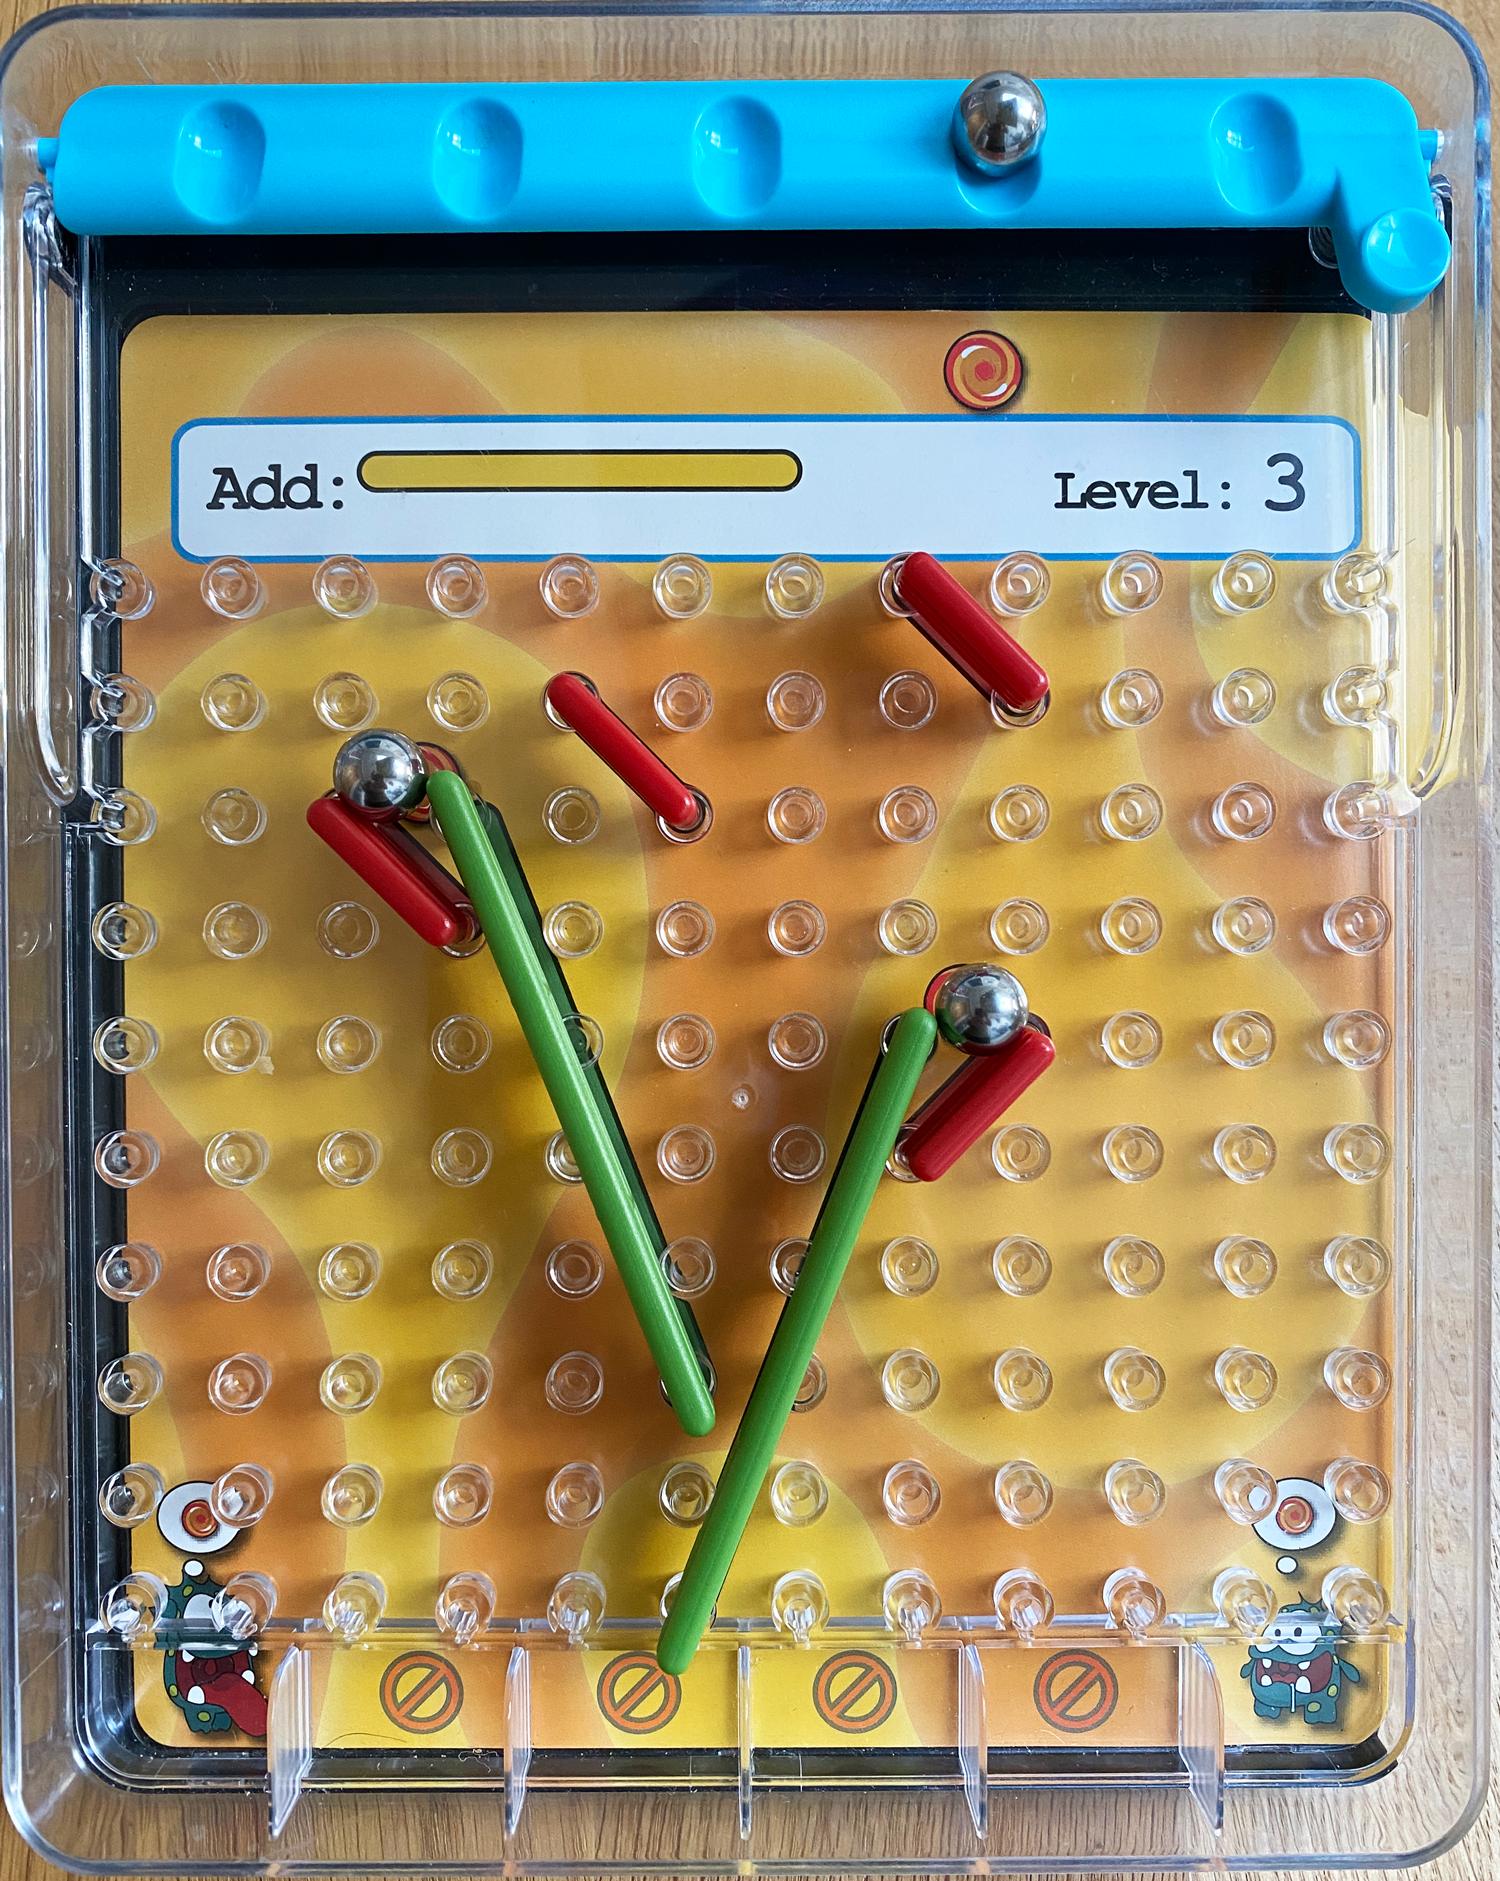 Feed-Me-Level-3